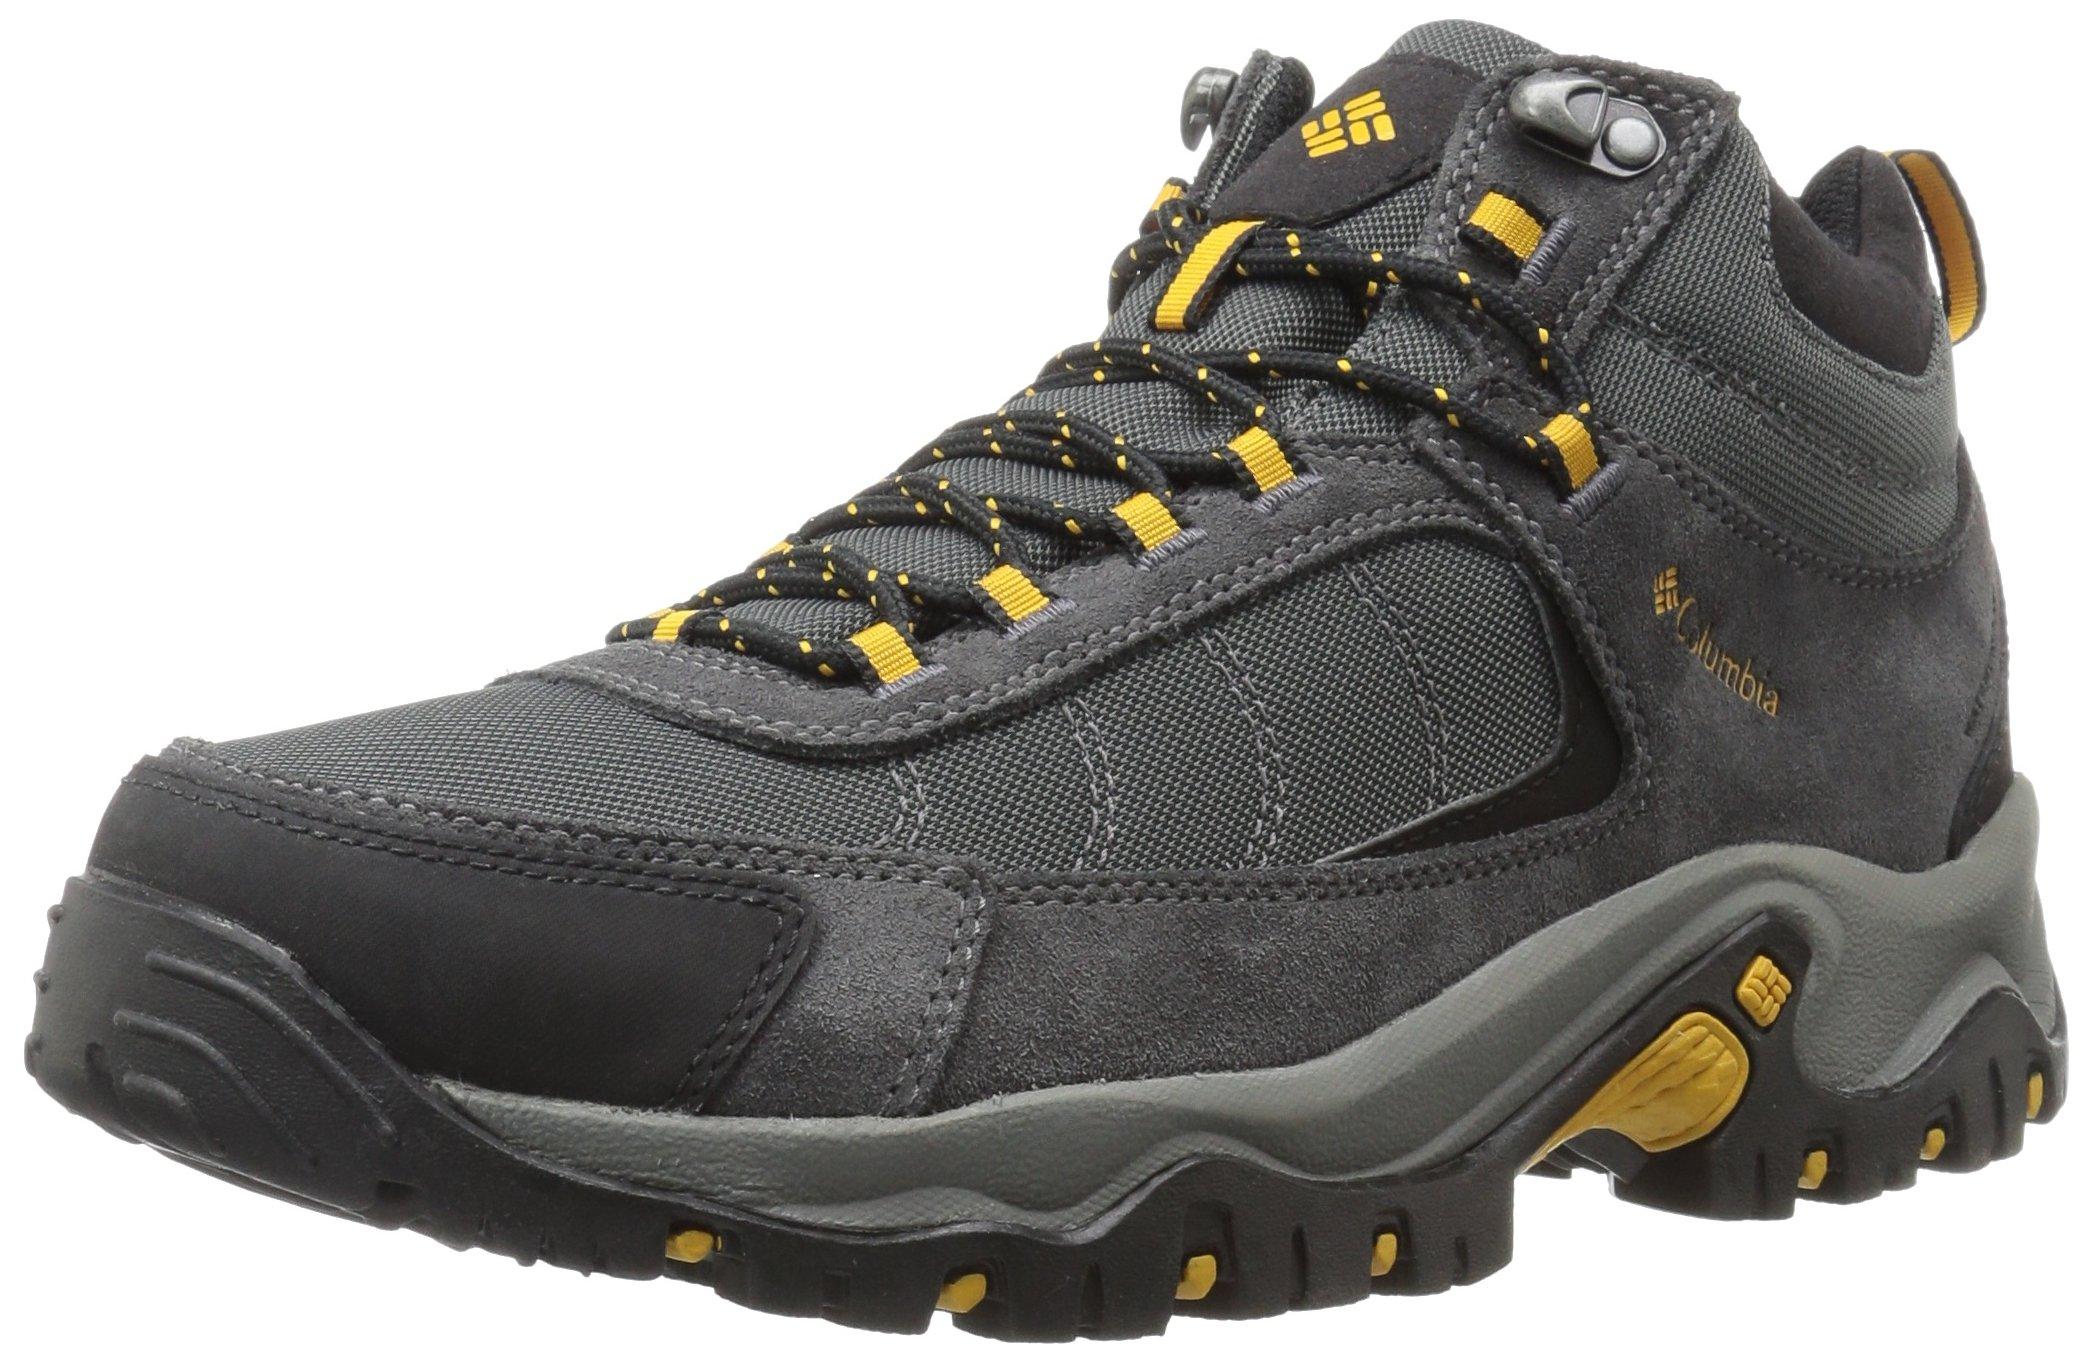 Columbia Men's Granite Ridge MID Waterproof Hiking Shoe, Dark Grey, Golden Yellow, 11 D US by Columbia